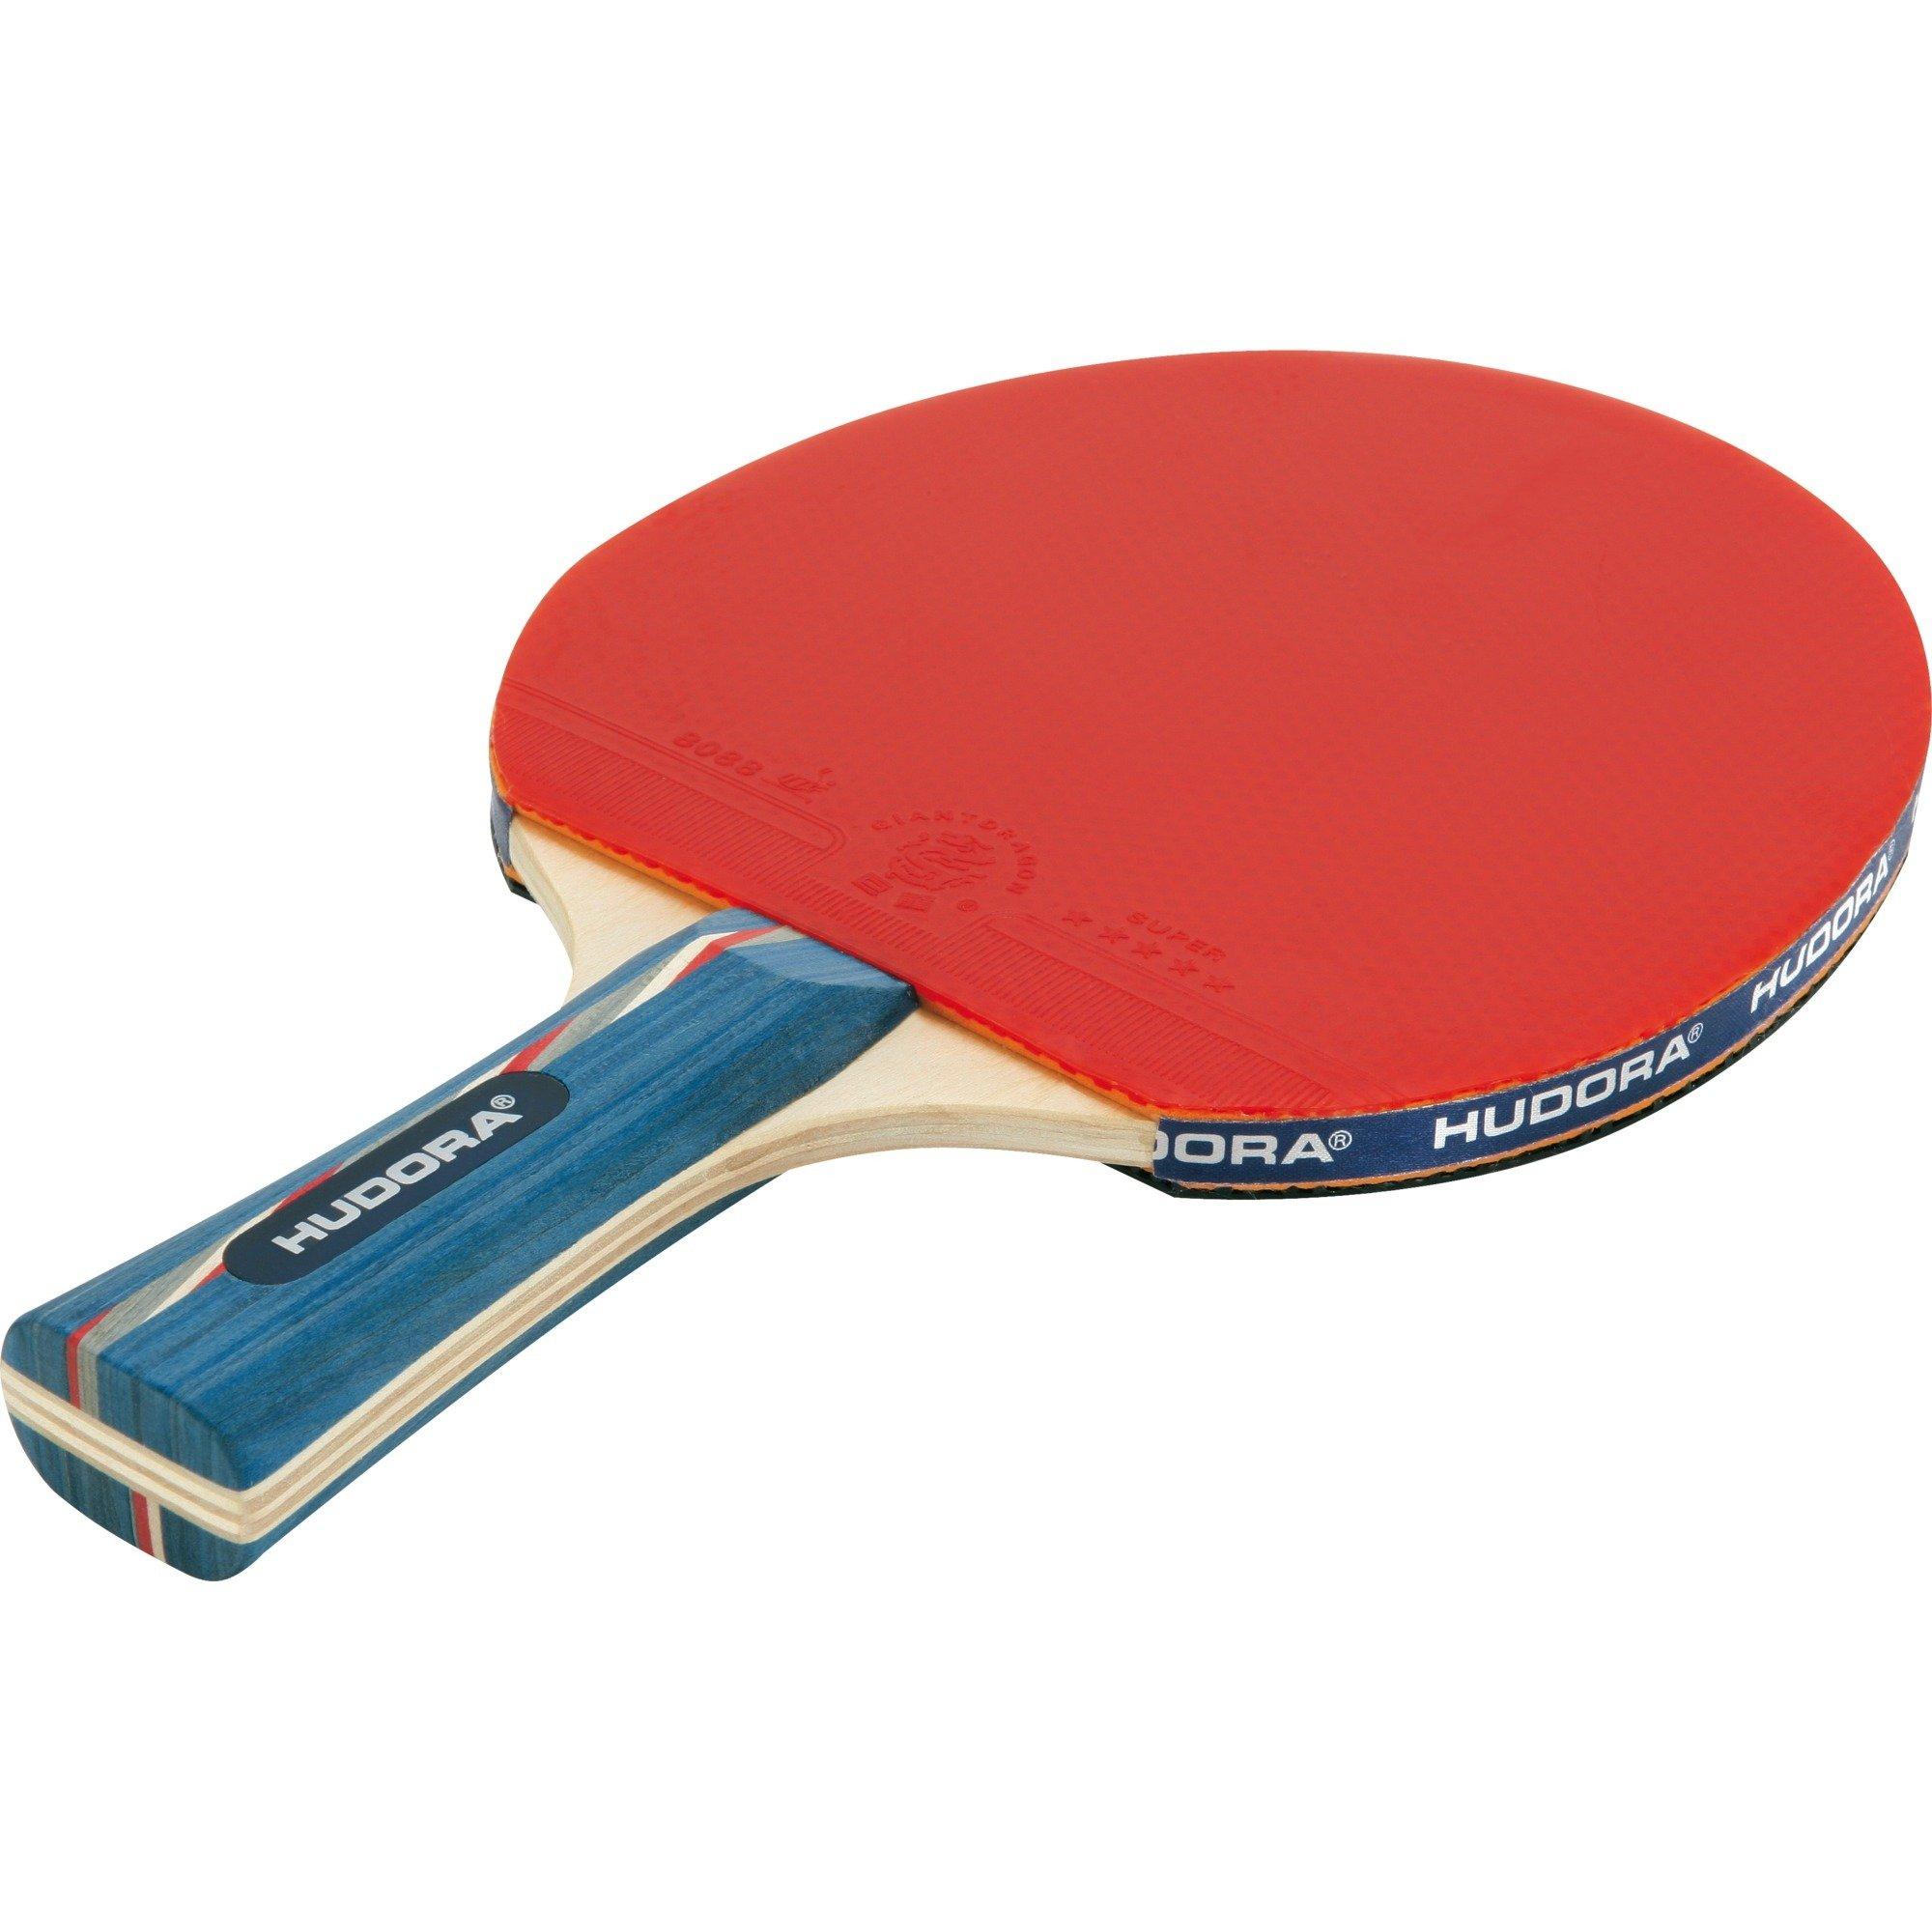 76266 raqueta para tenis de mesa, Aparato para fitness